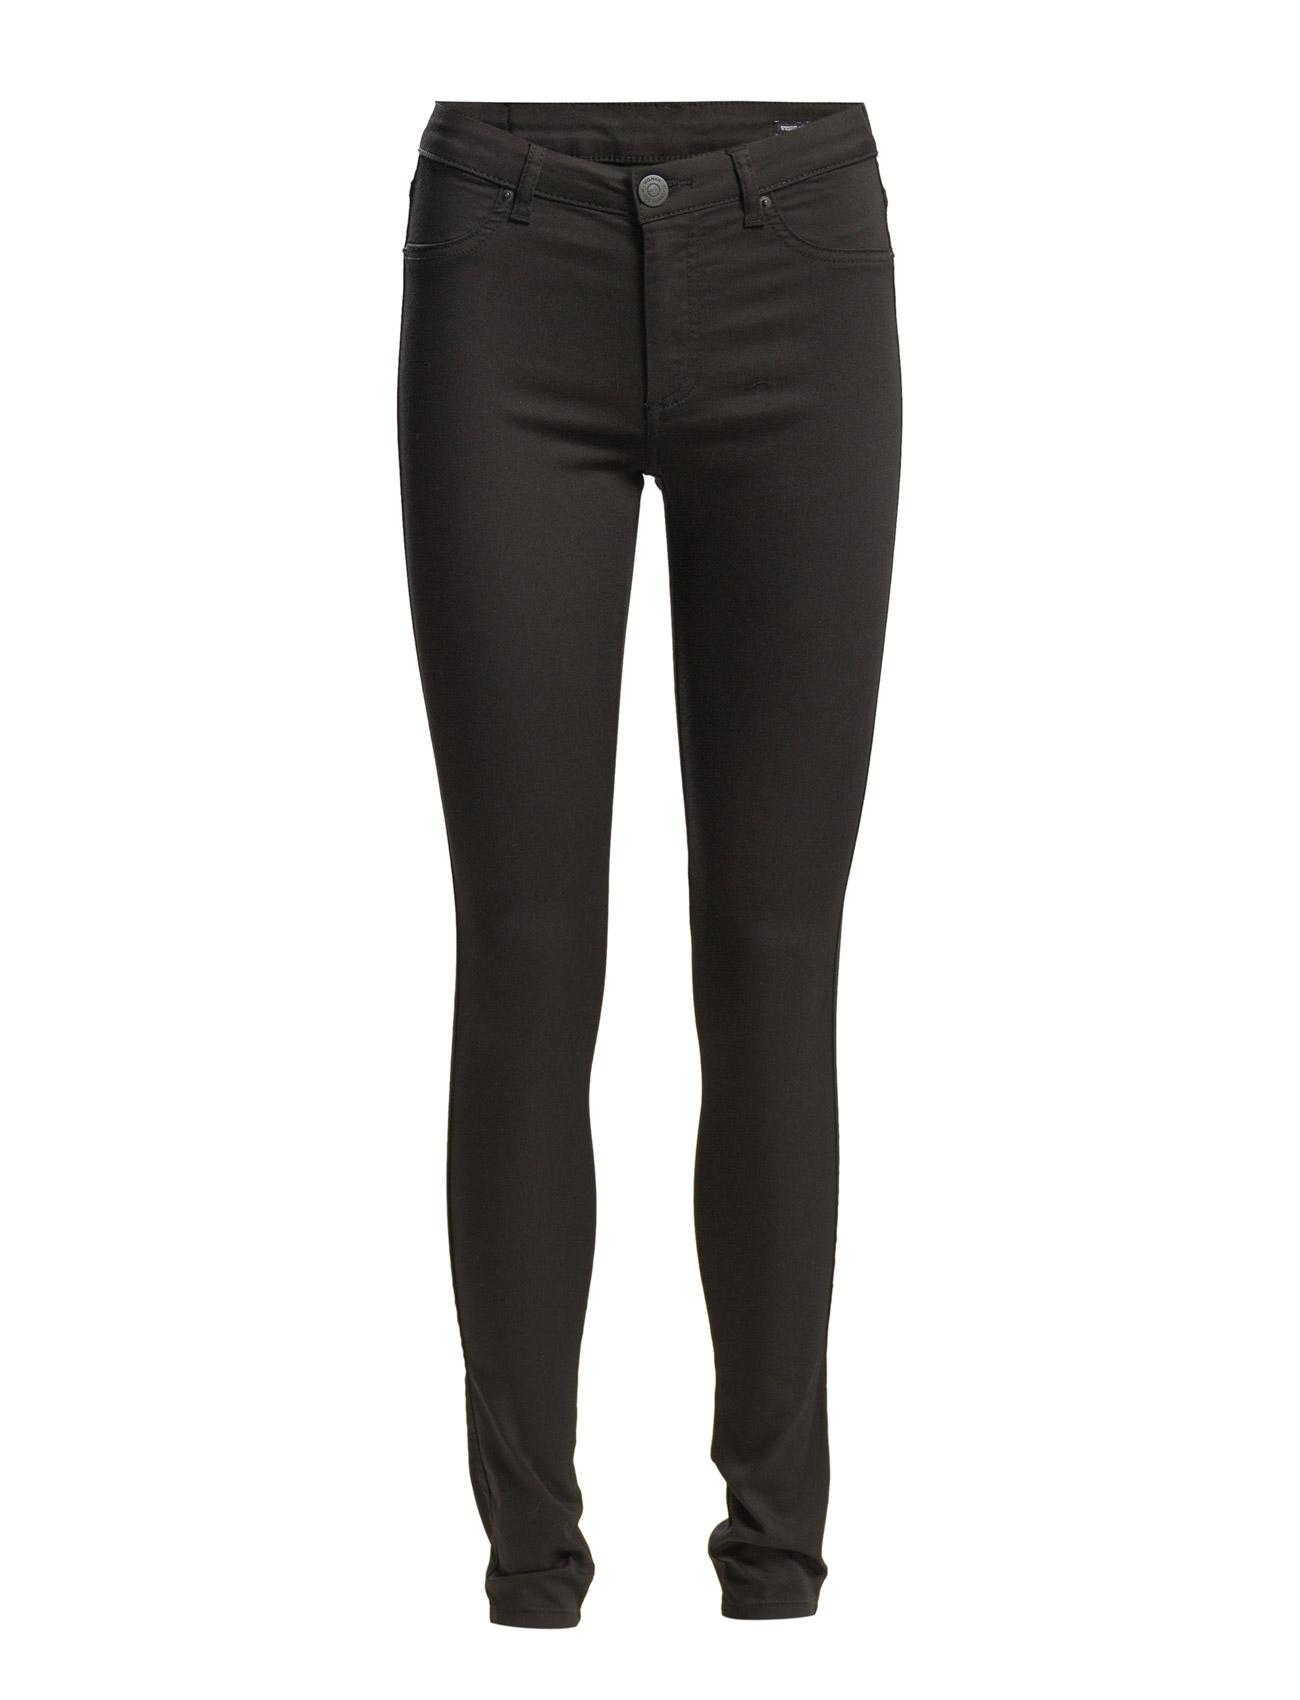 Penelope 603 Black Stone, Jeans FIVEUNITS Skinny til Damer i